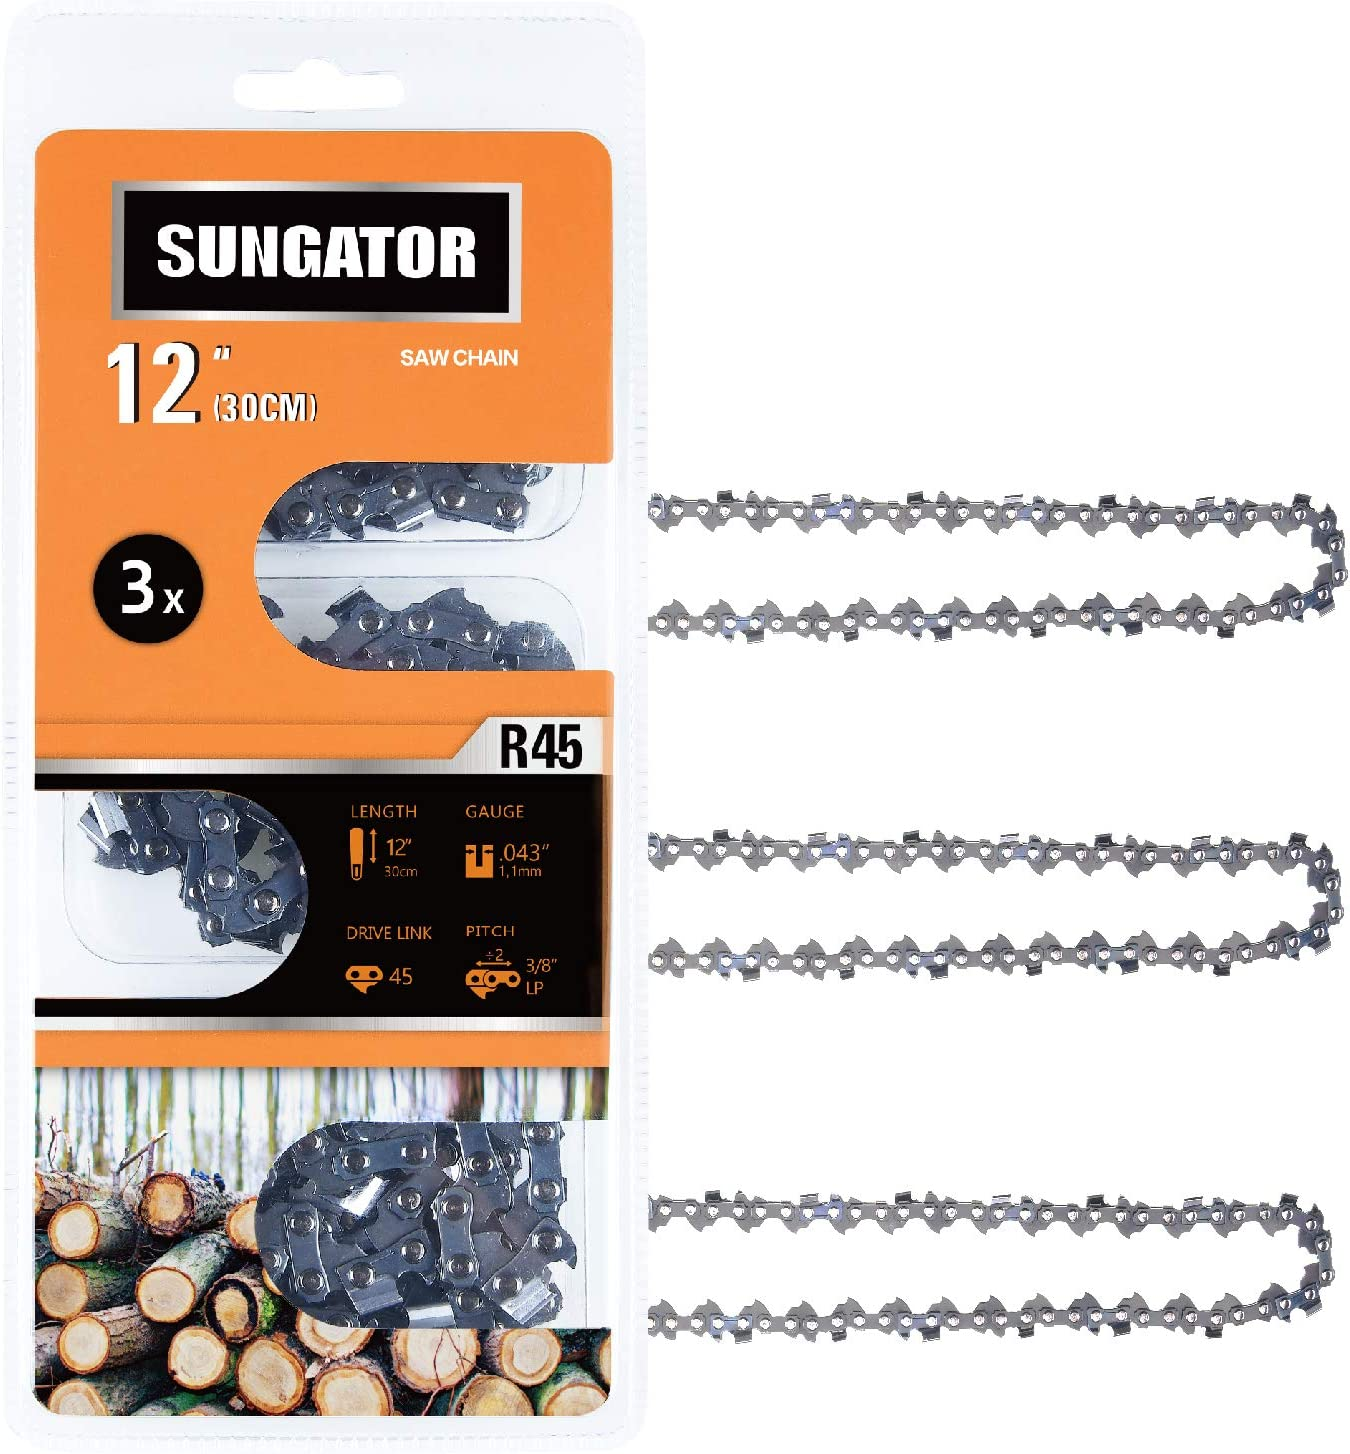 "SUNGATOR 3-Pack 12 Inch Chainsaw Chain SG-R45, 3/8"" LP Pitch - .043"" Gauge - 45 Drive Links, Fits Craftsman, Husqvarna, Ryobi, Dewalt"